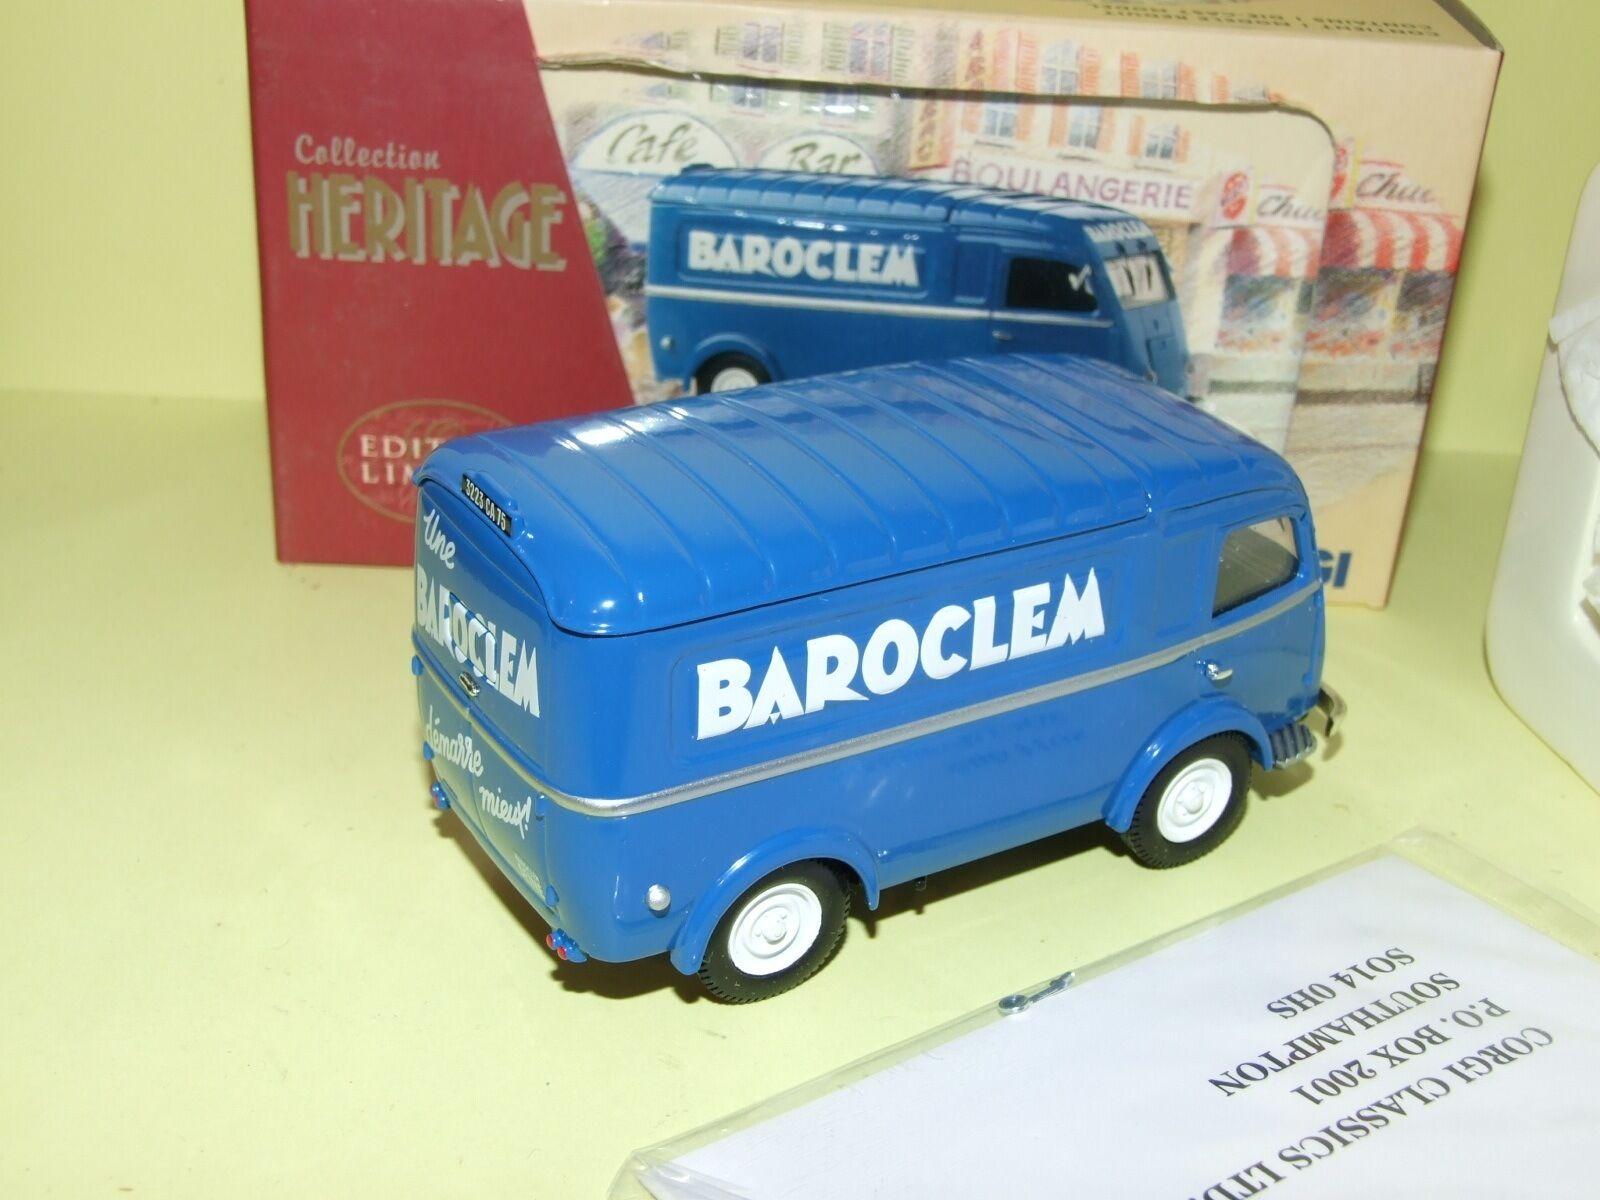 RENAULT 1000 Kg BAROCLEM BAROCLEM BAROCLEM CORGI EX70516 1 43 6e690a